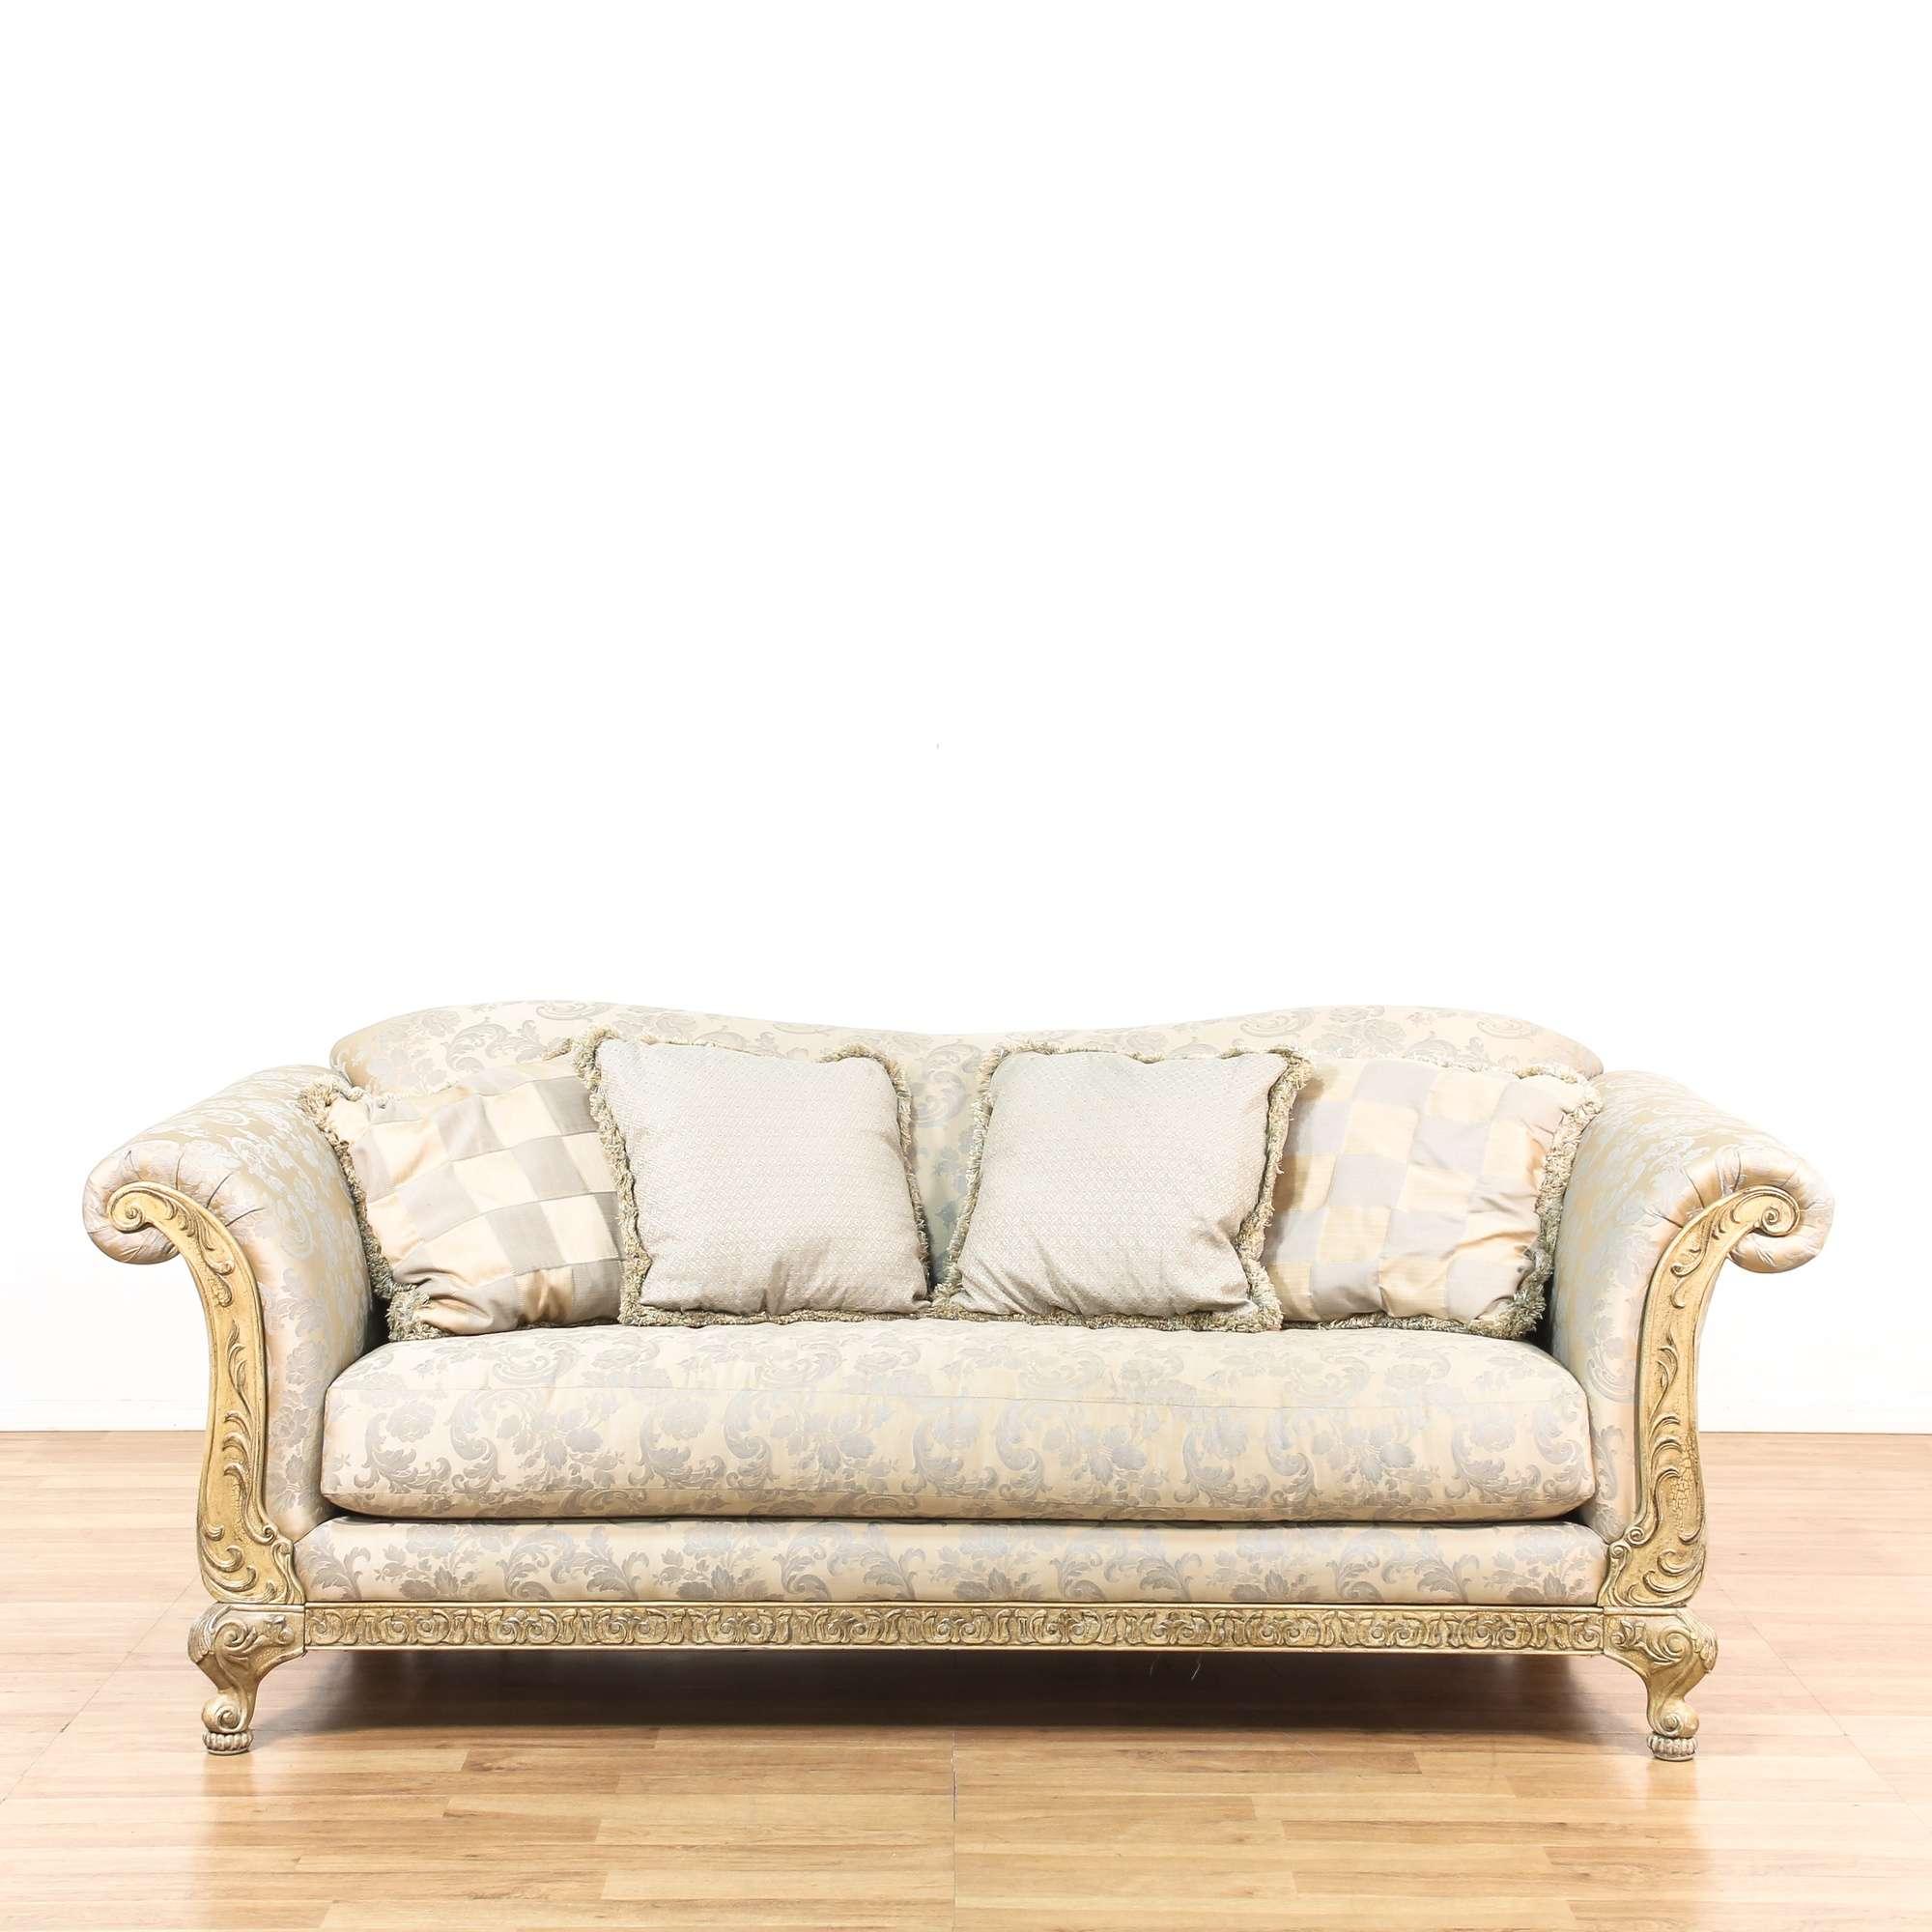 White & Blue Silk Wooden Carved Sofa | Loveseat Vintage Furniture ...